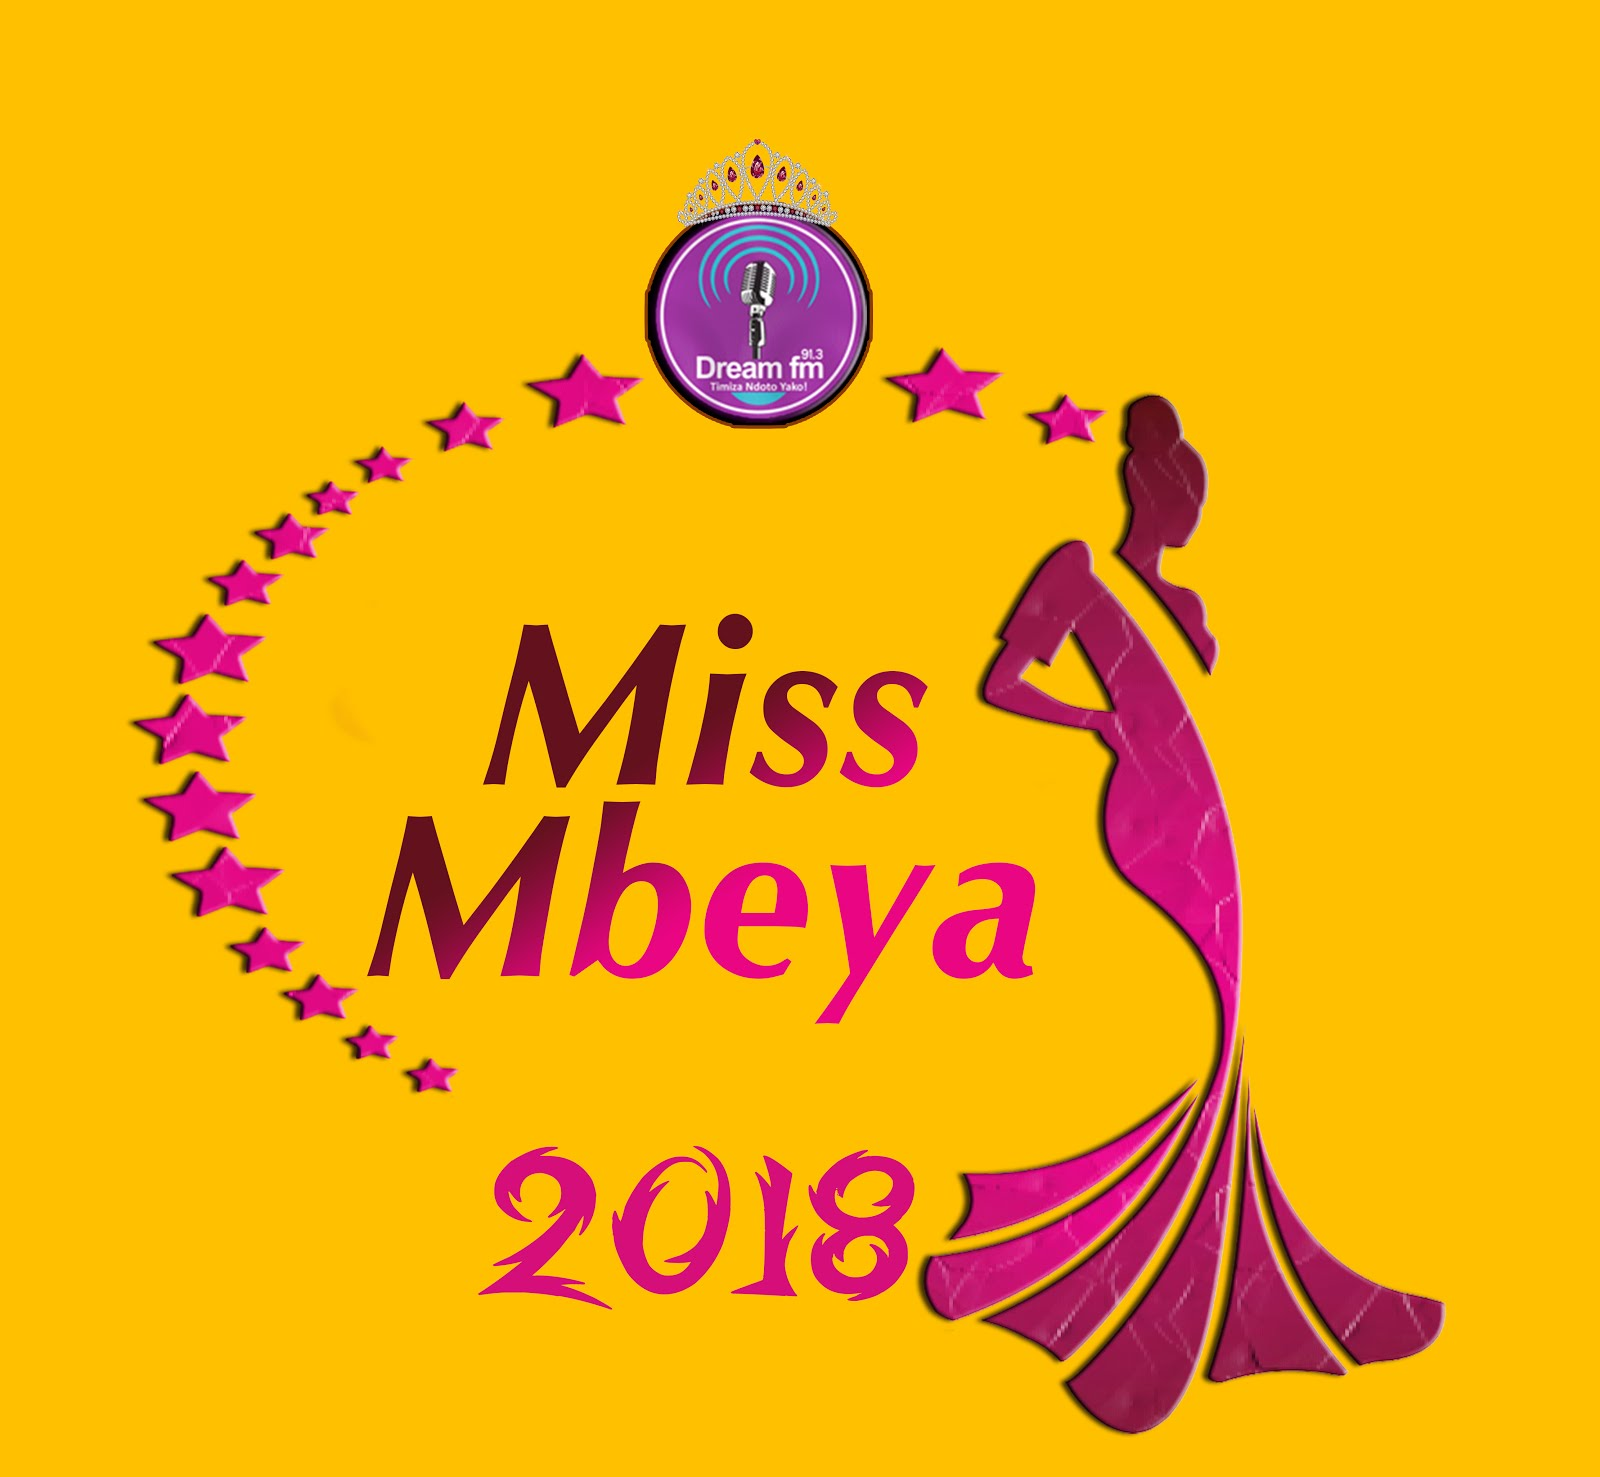 MISS MBEYA 2018